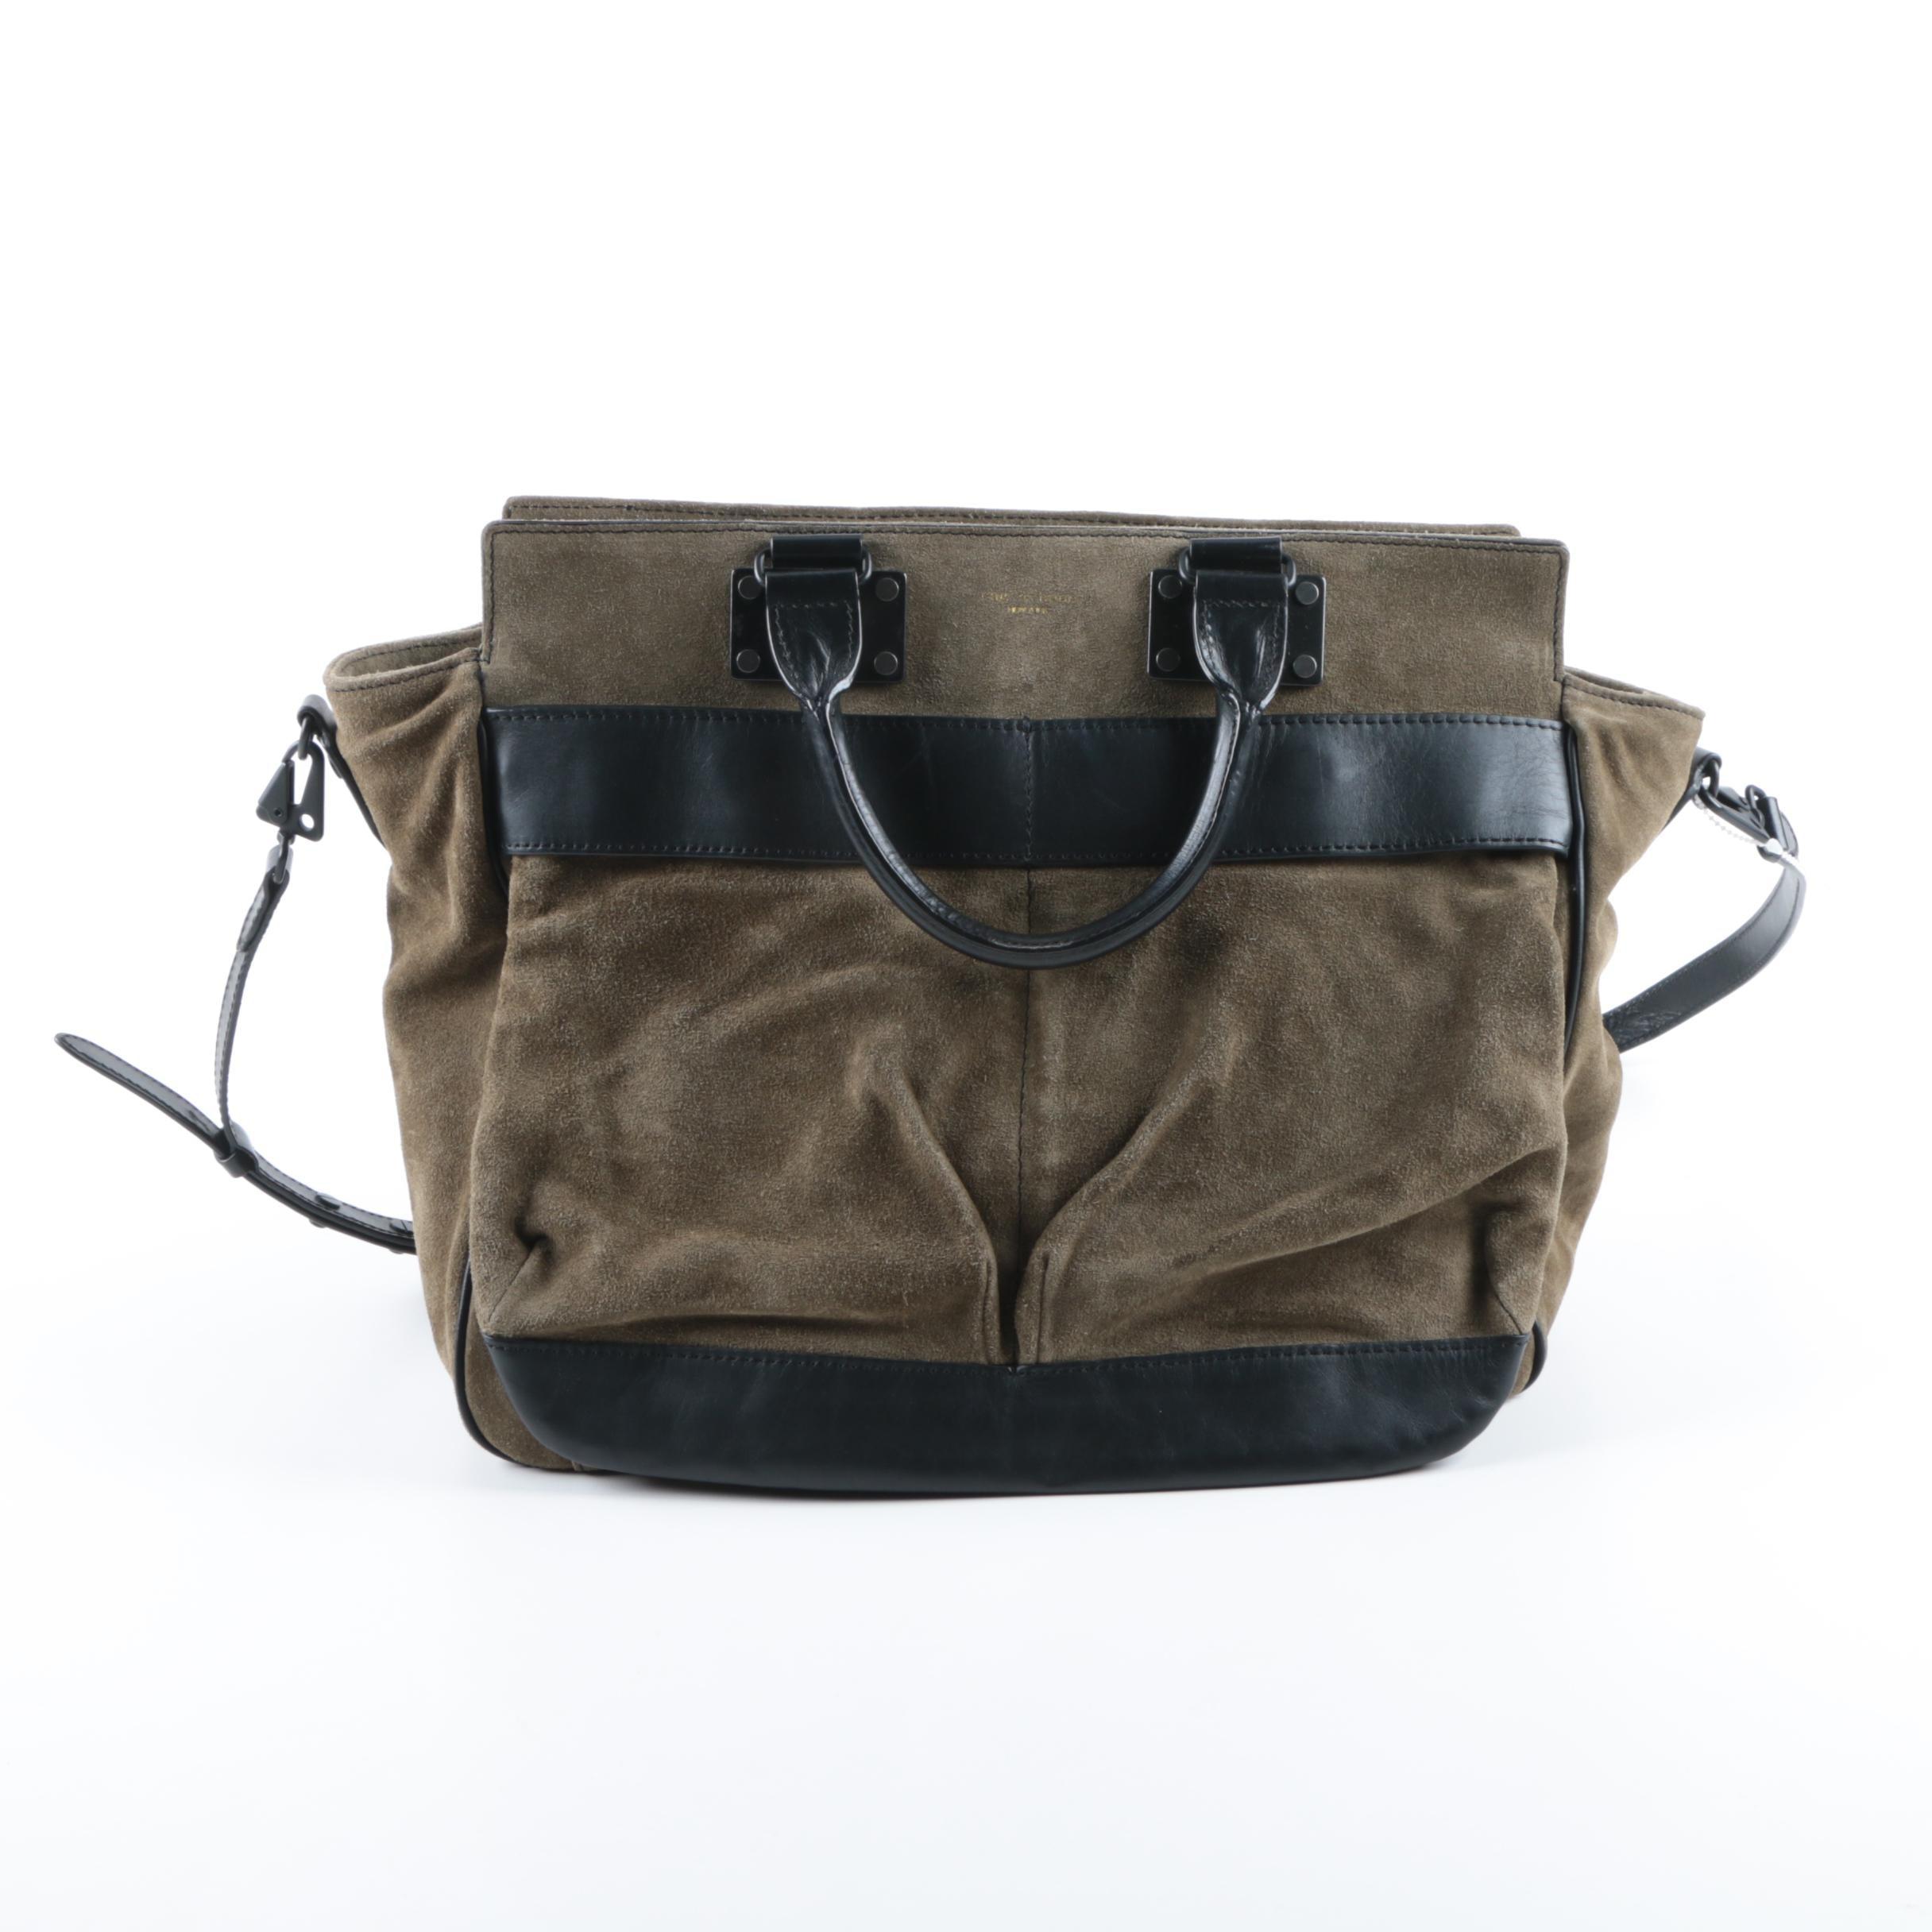 Rag & Bone Leather and Suede Handbag